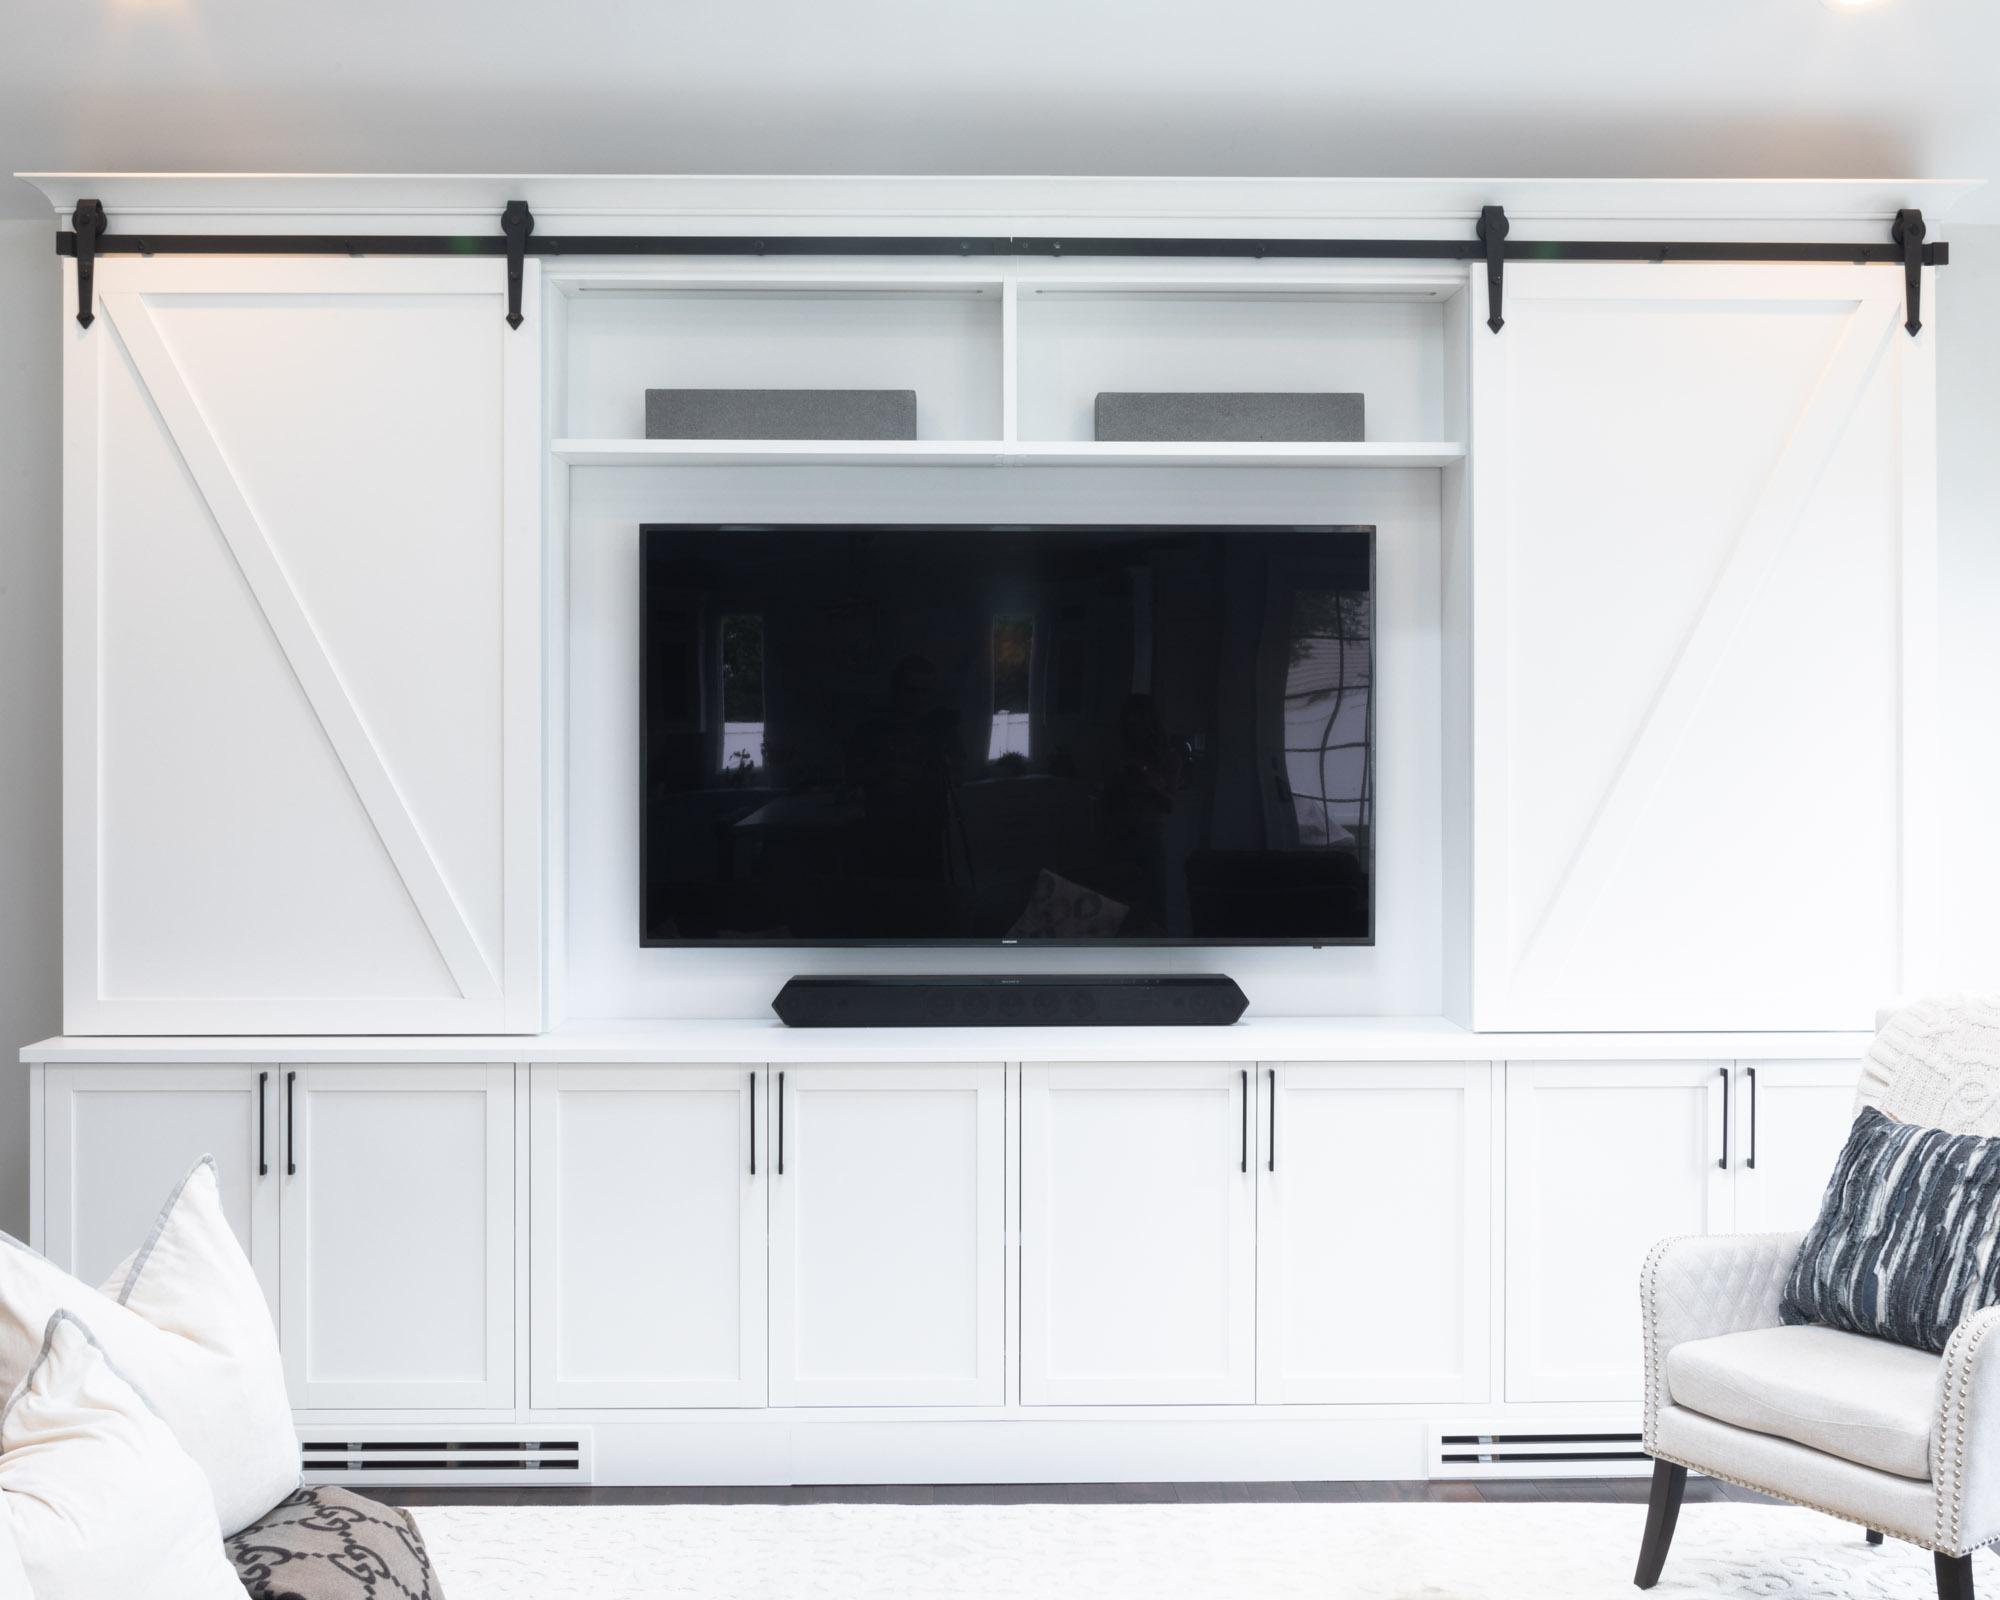 california-closets-media-center-iwth-enclosed-tv-the-glamorous-gal